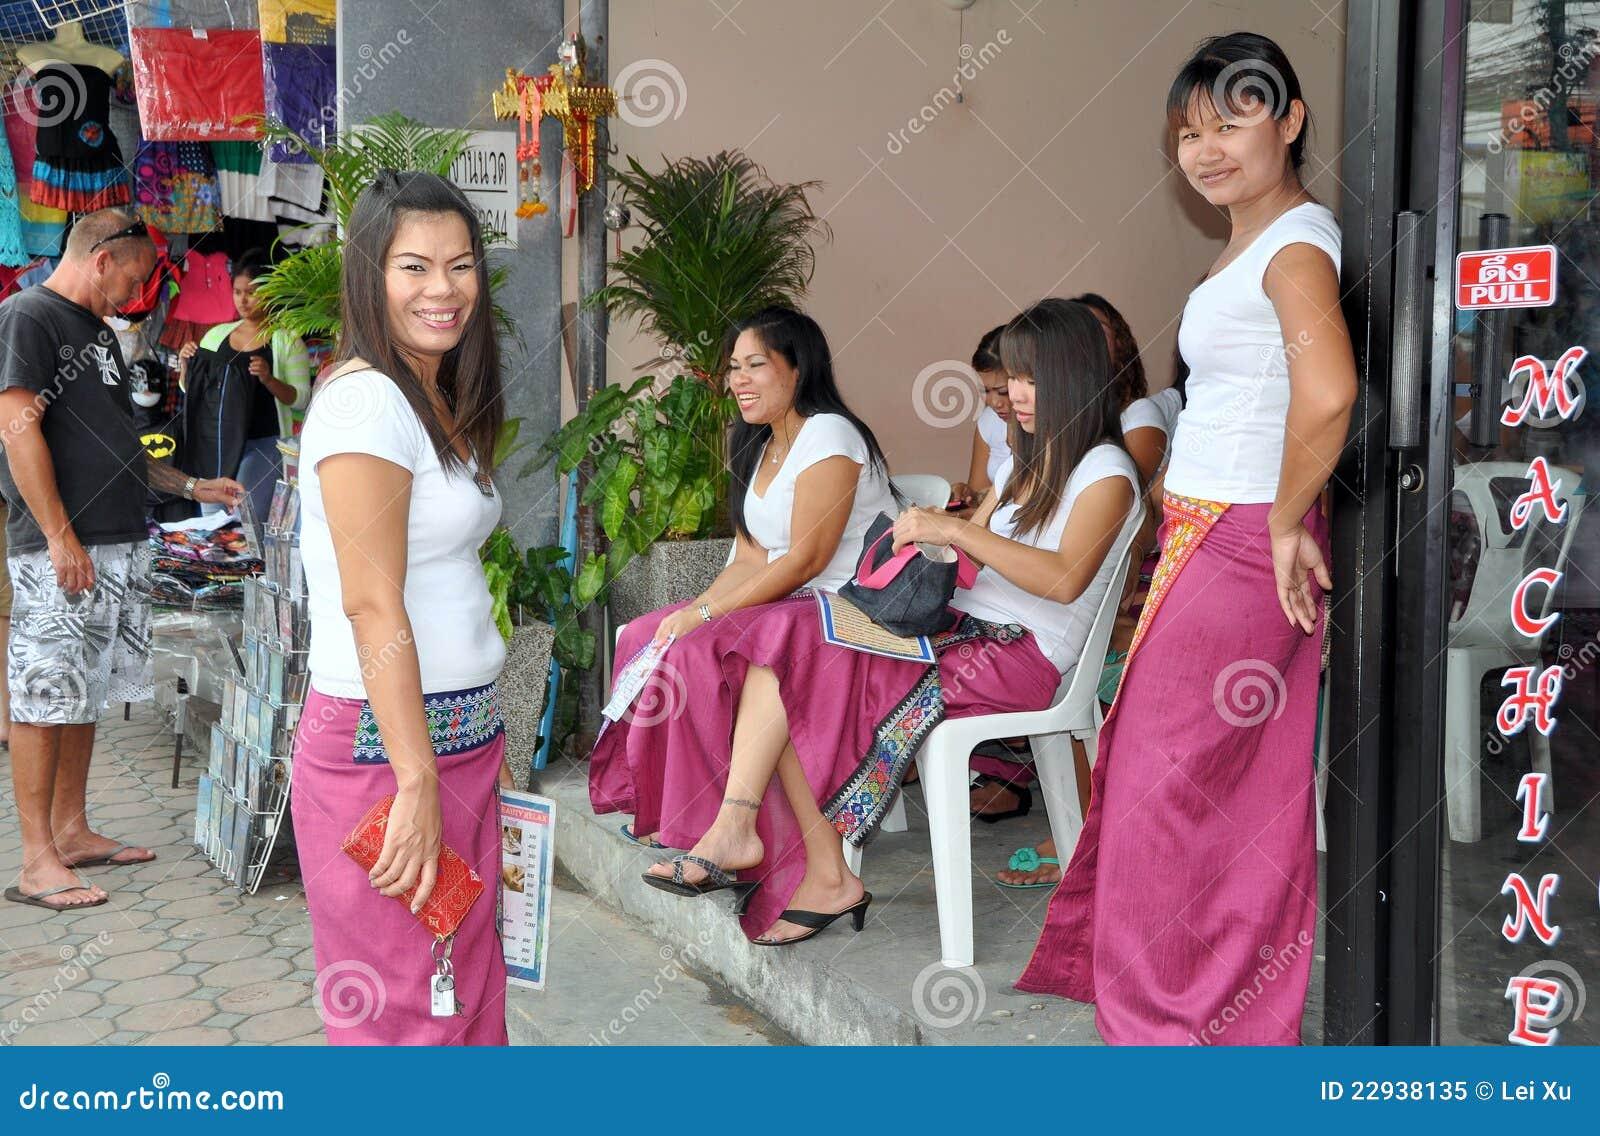 orchid thai massage porno massage